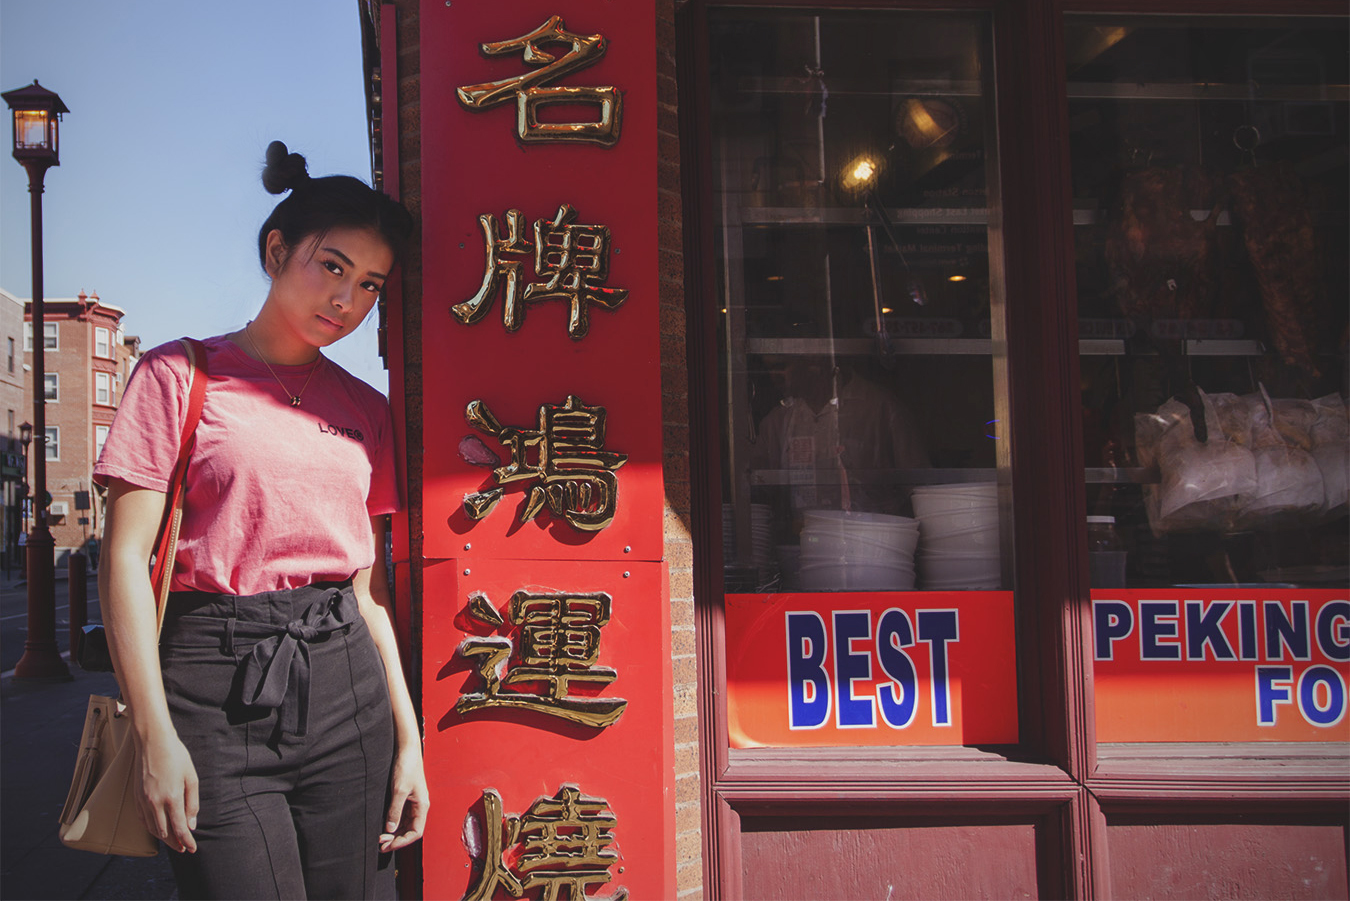 Amber_Shi_blush_fashion_cosmetics_makeup_outdoors_sunlight_sexy_light_asian_youth_young_women_college_life_asian_beauty_chinese_neighborhood